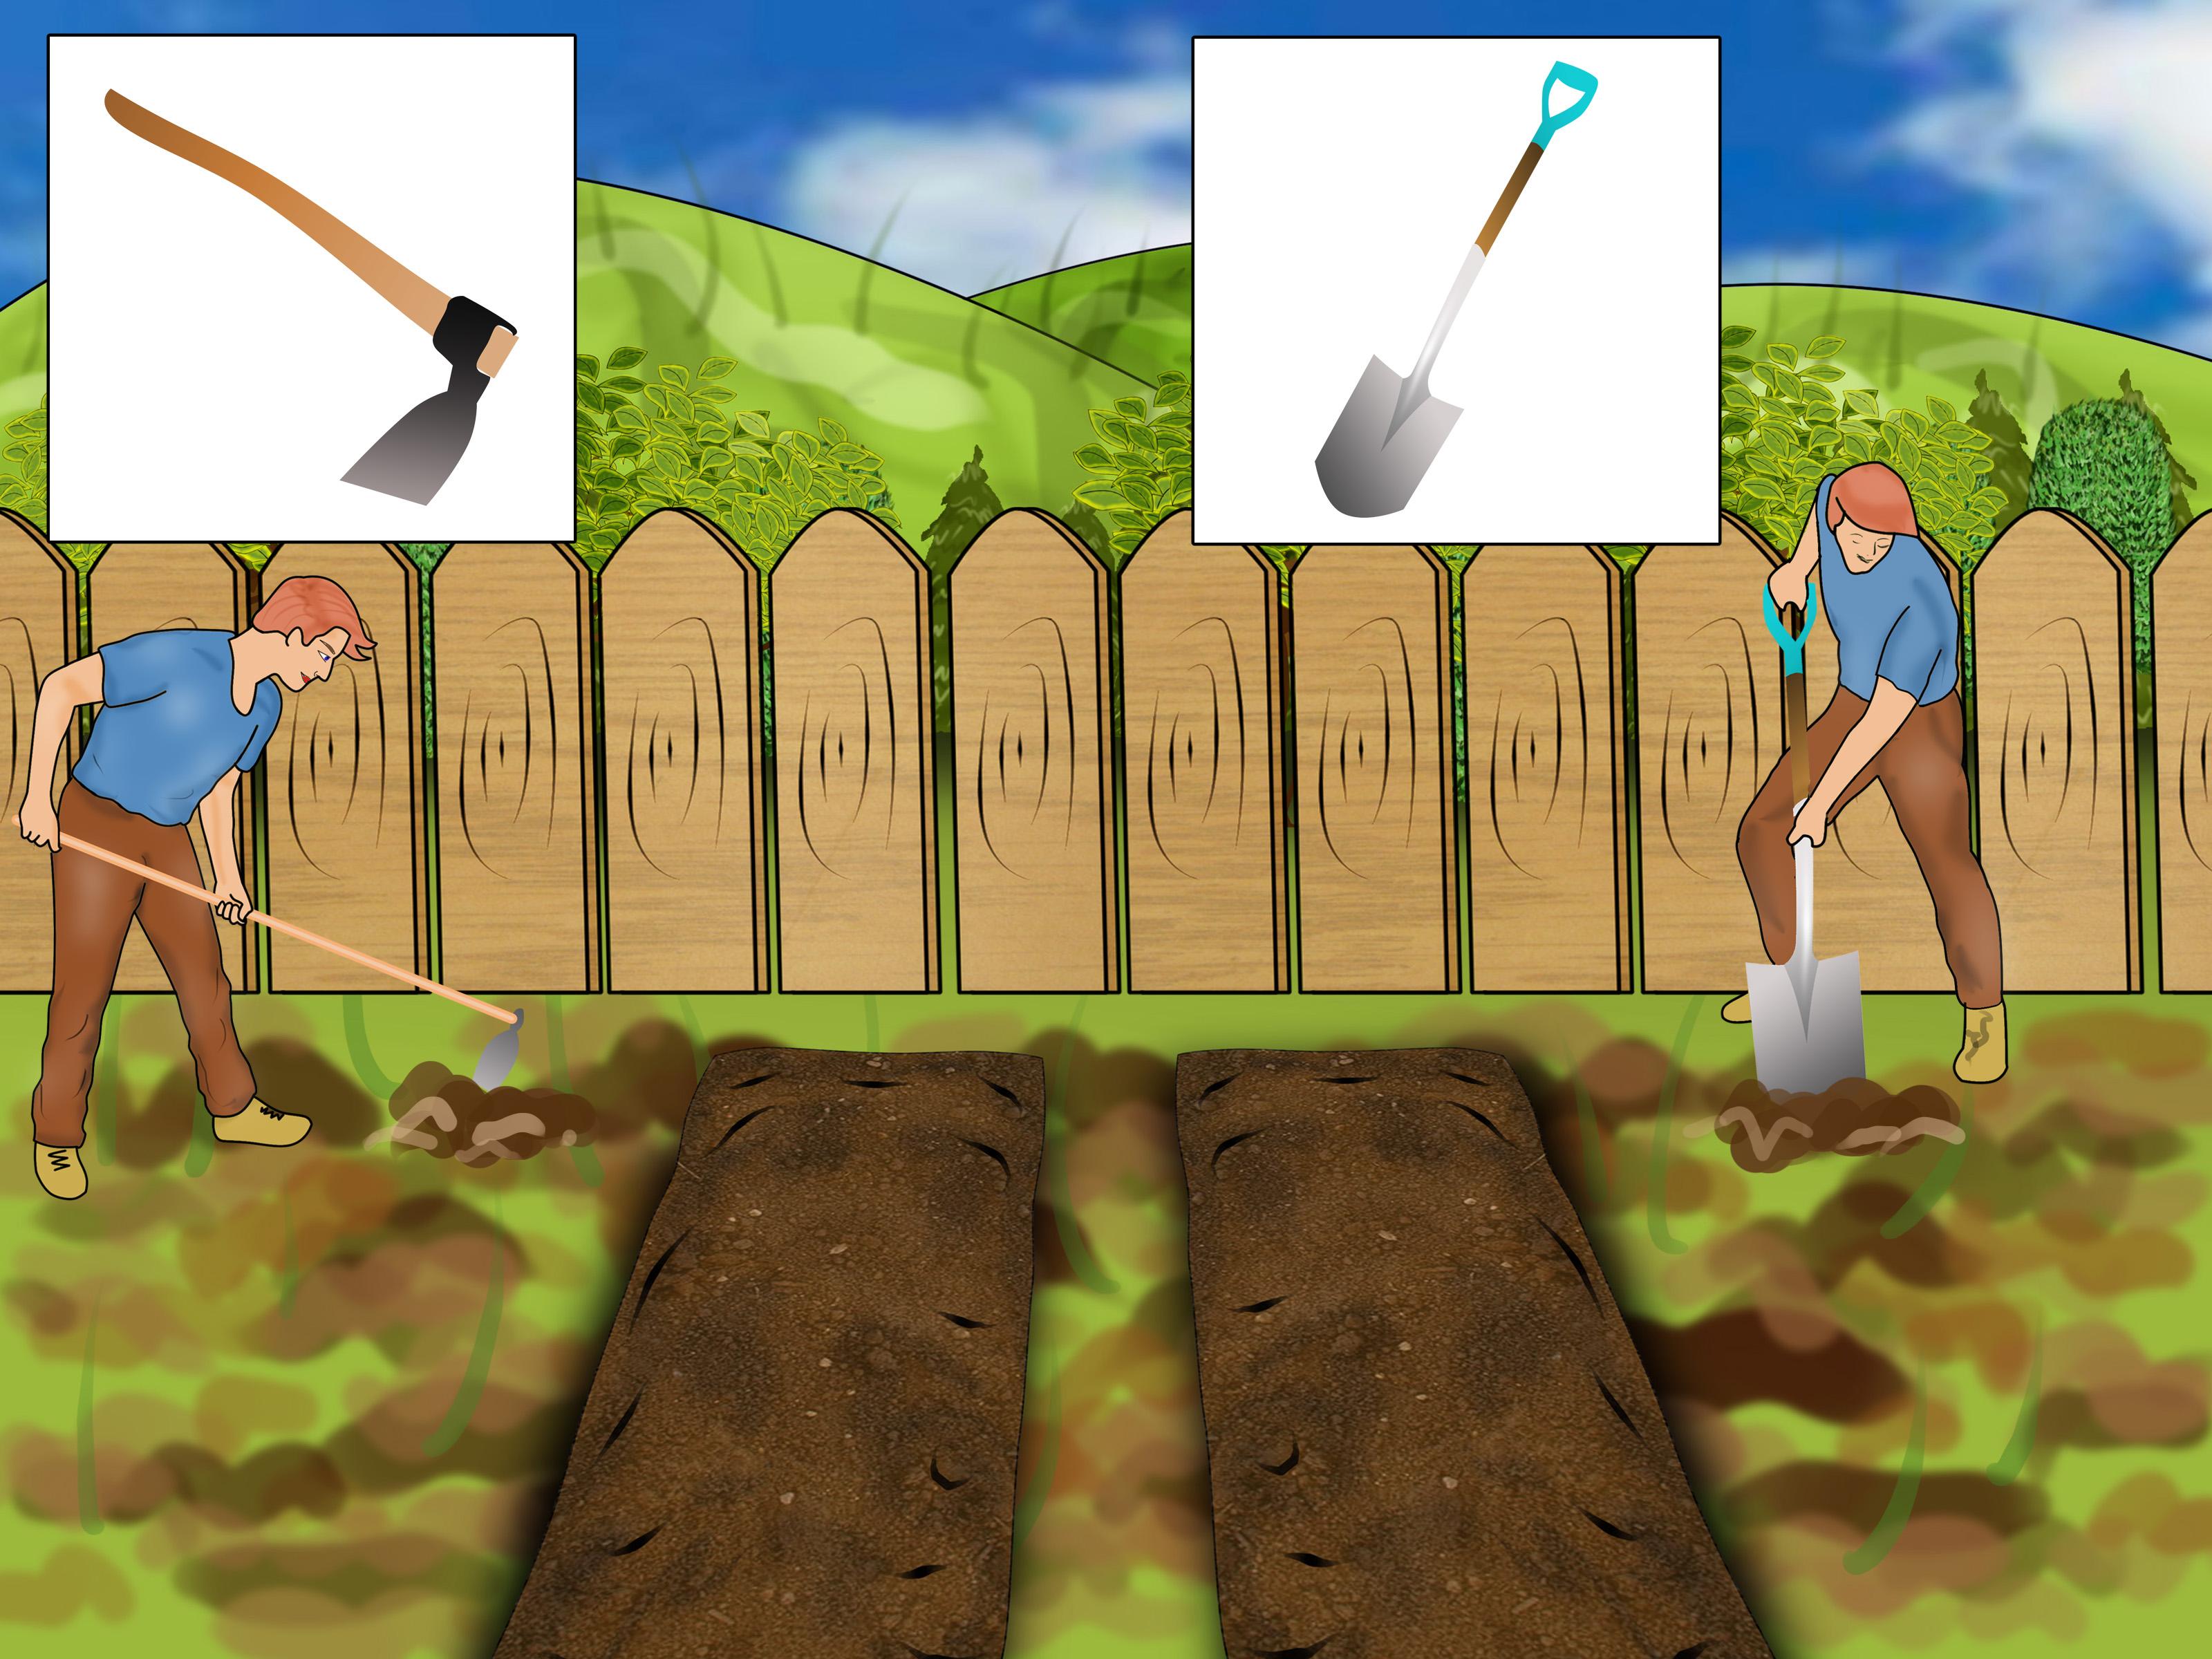 3 Ways To Buy Basic Garden Tools